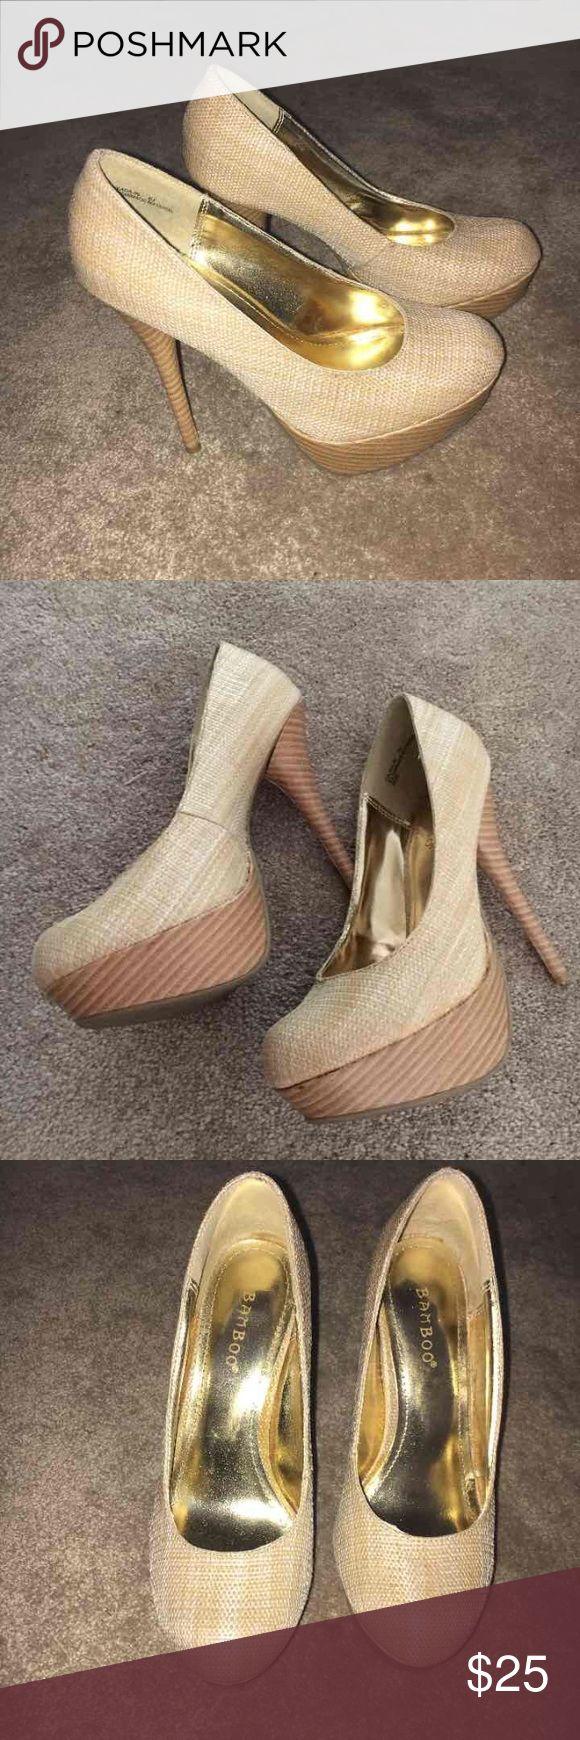 Beige high heels pumps like new 🎀 Beautiful beige pumps like new size 6.6   Bamboo bamboo Shoes Platforms